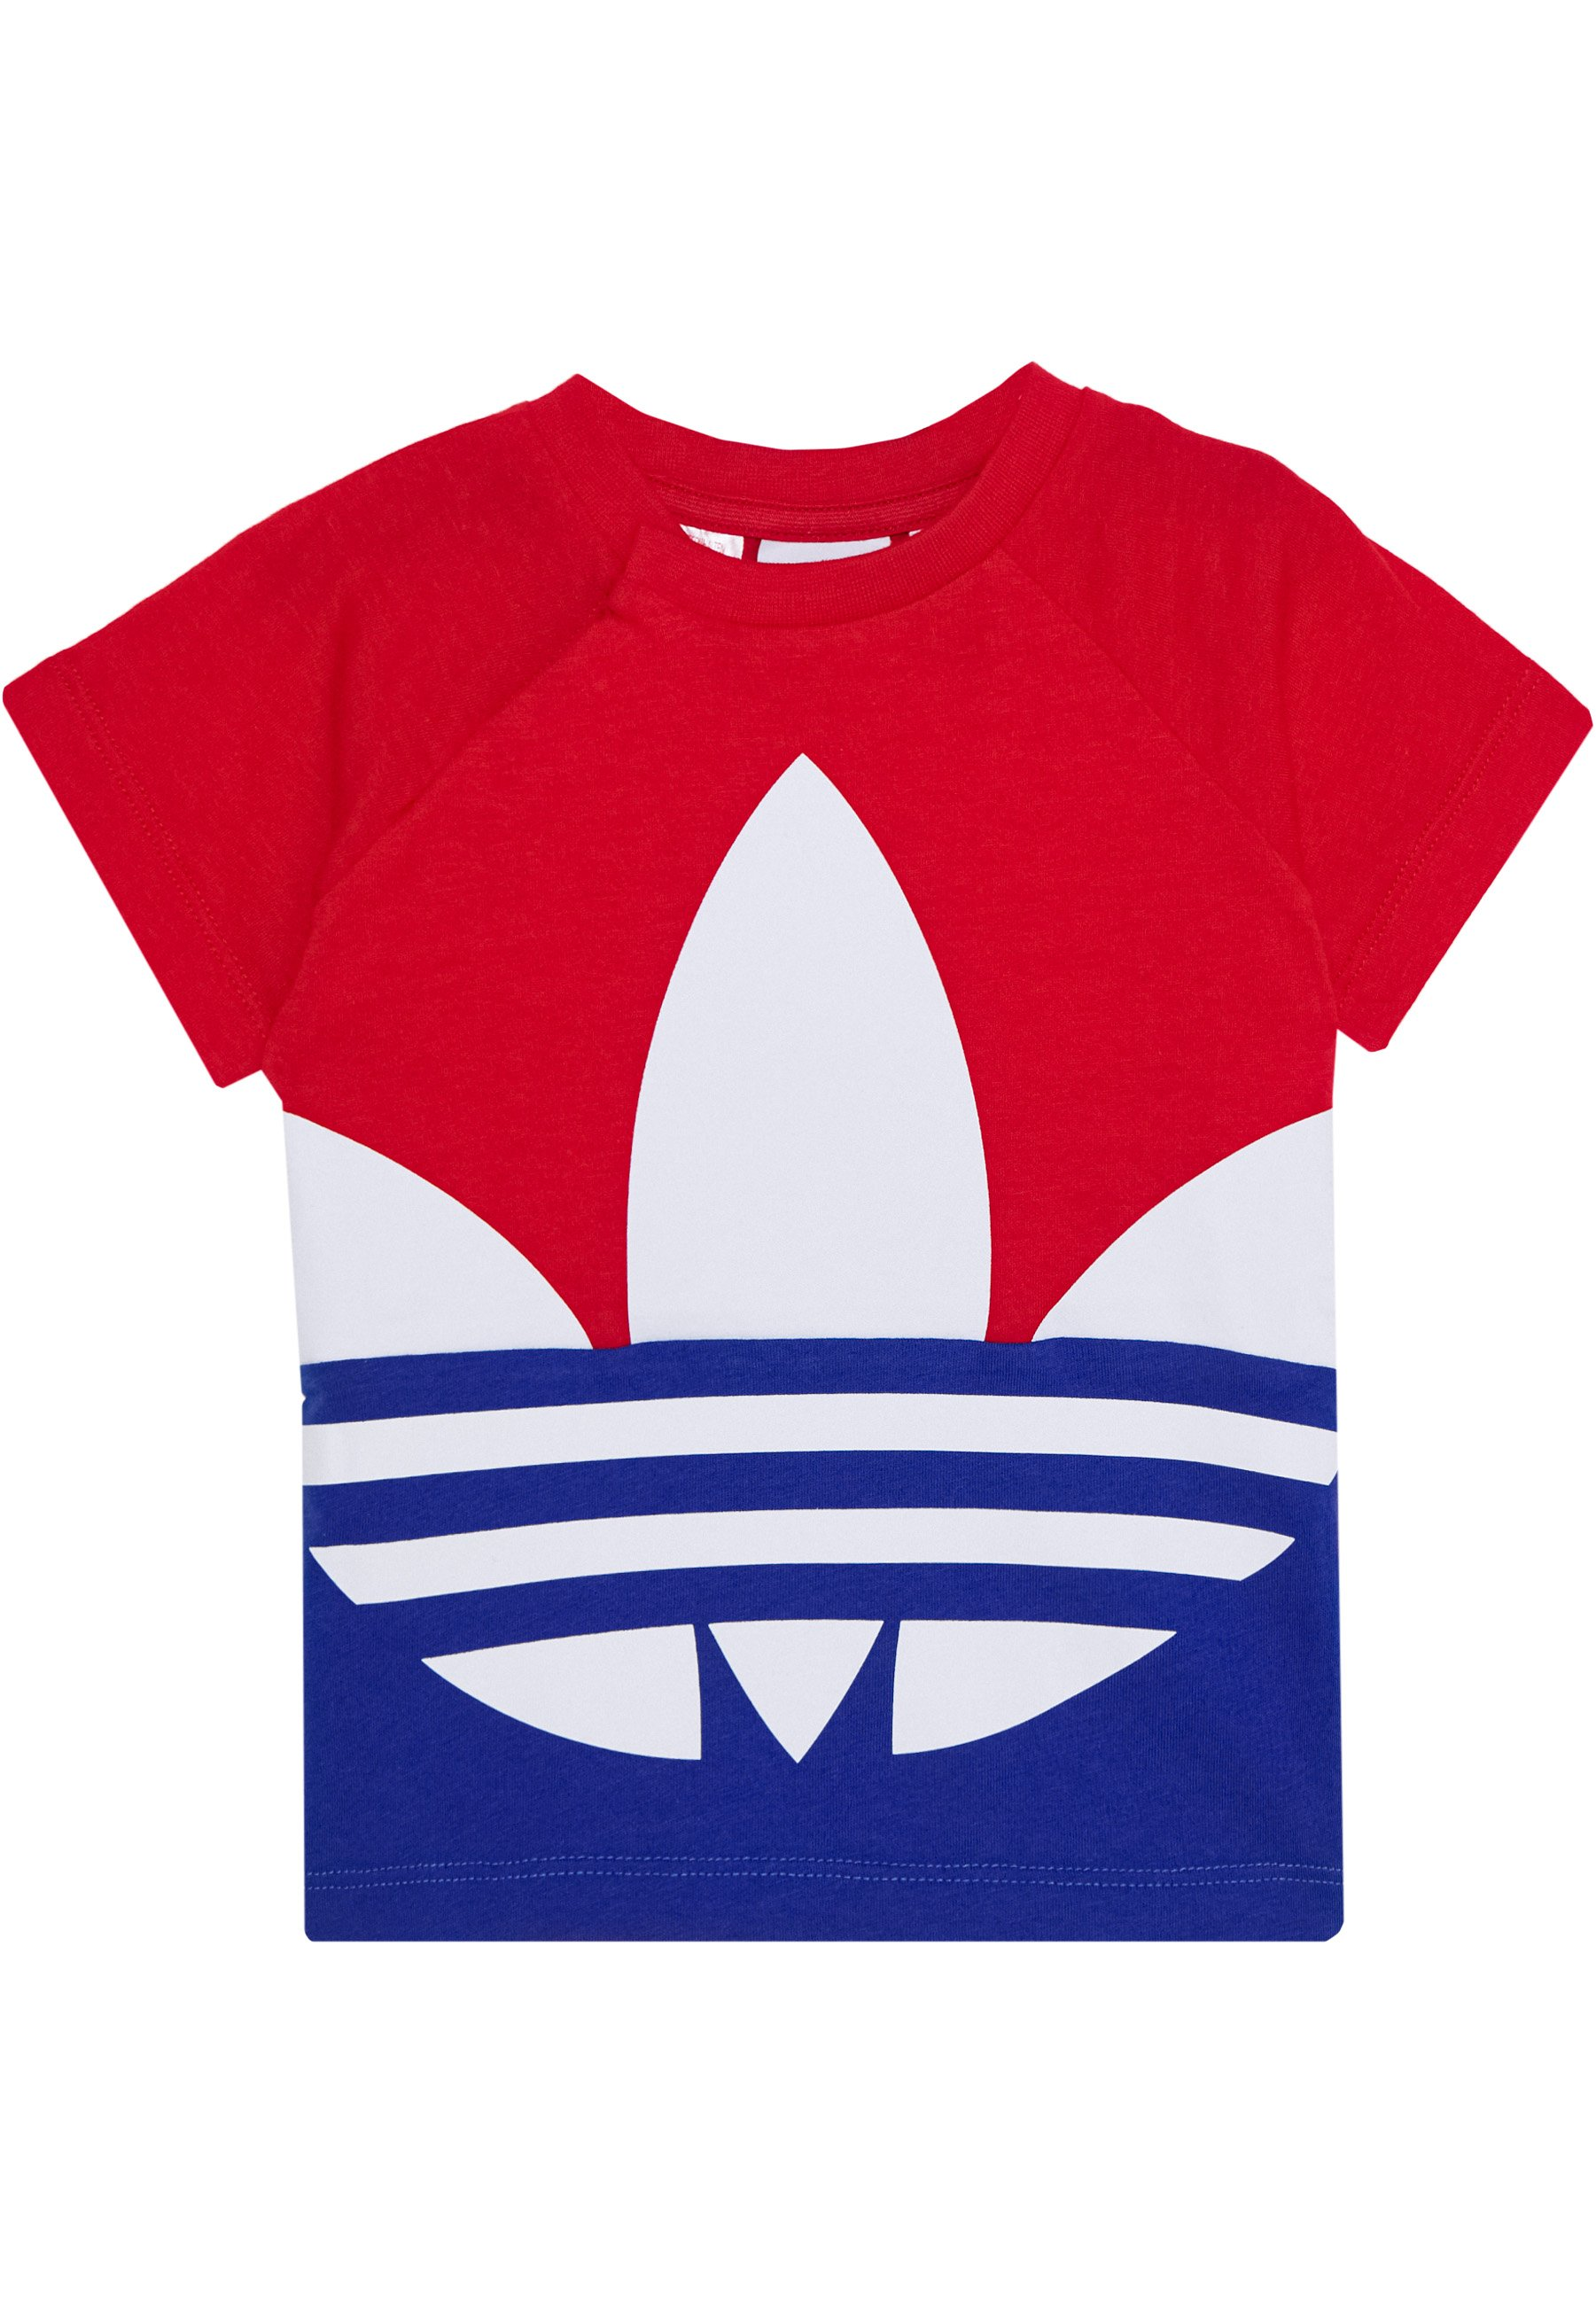 Adidas Originals Big Trefoil Tee - T-shirts Med Print Scarlet/royal Blue/white